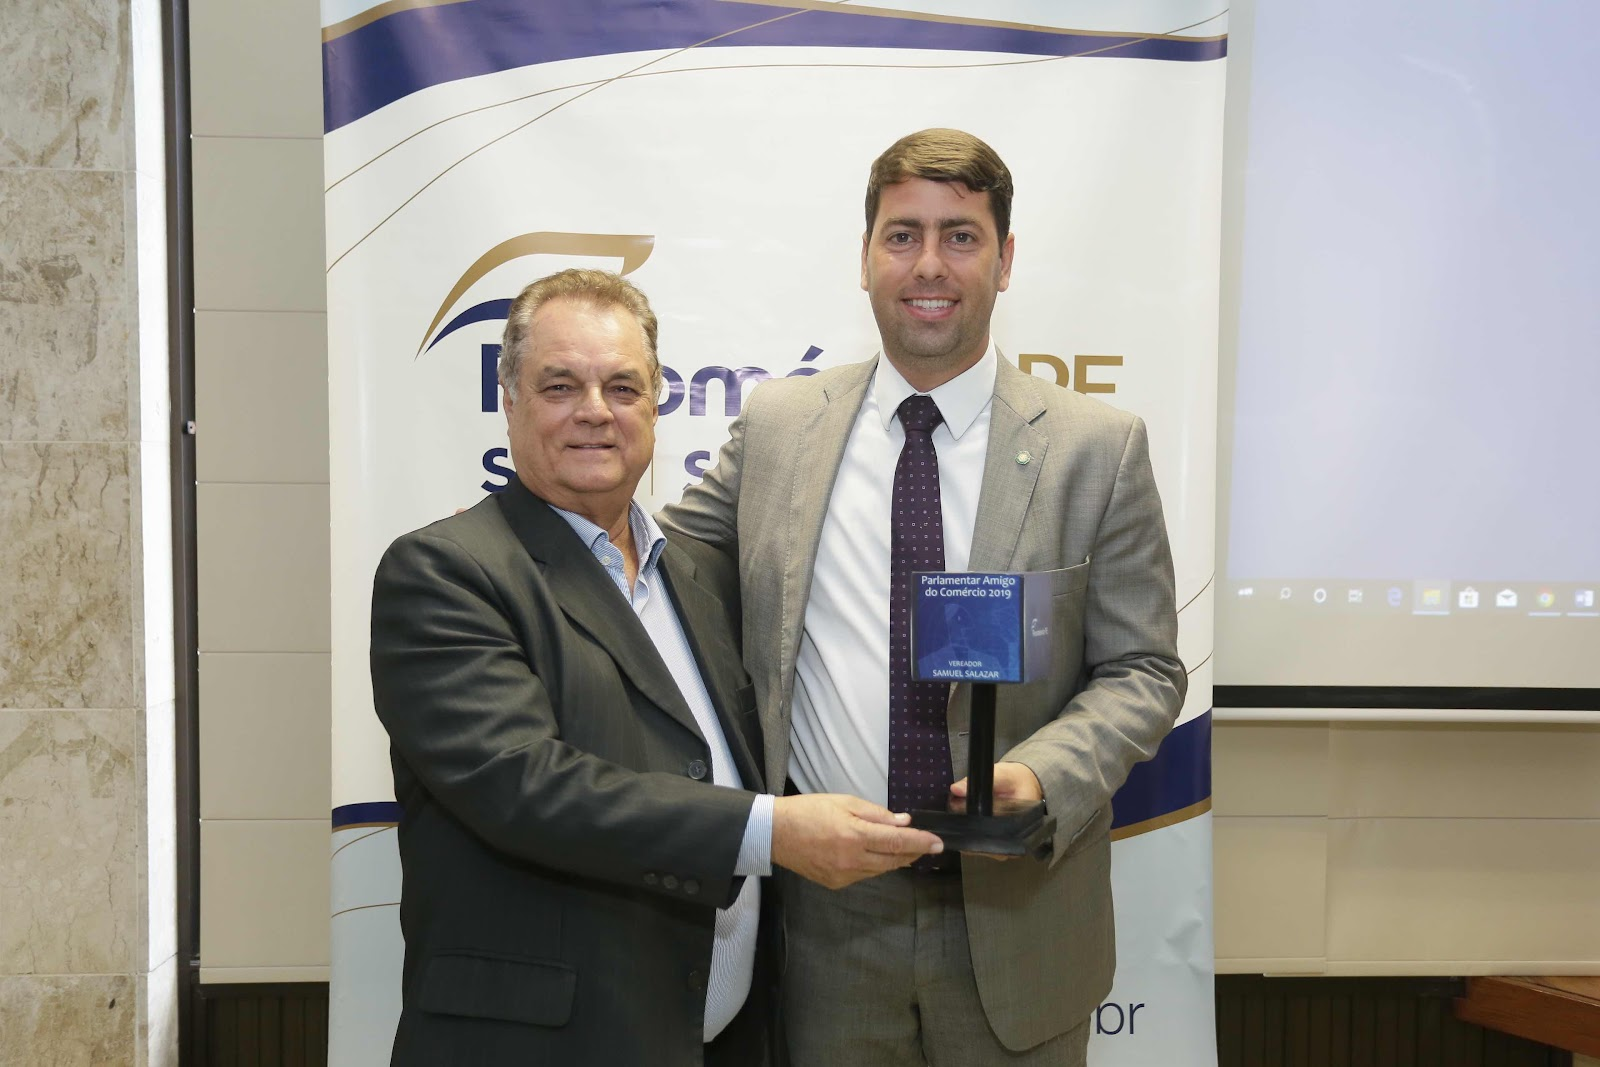 Vereador Samuel Salazar recebe troféu  parlamentar amigo do comércio